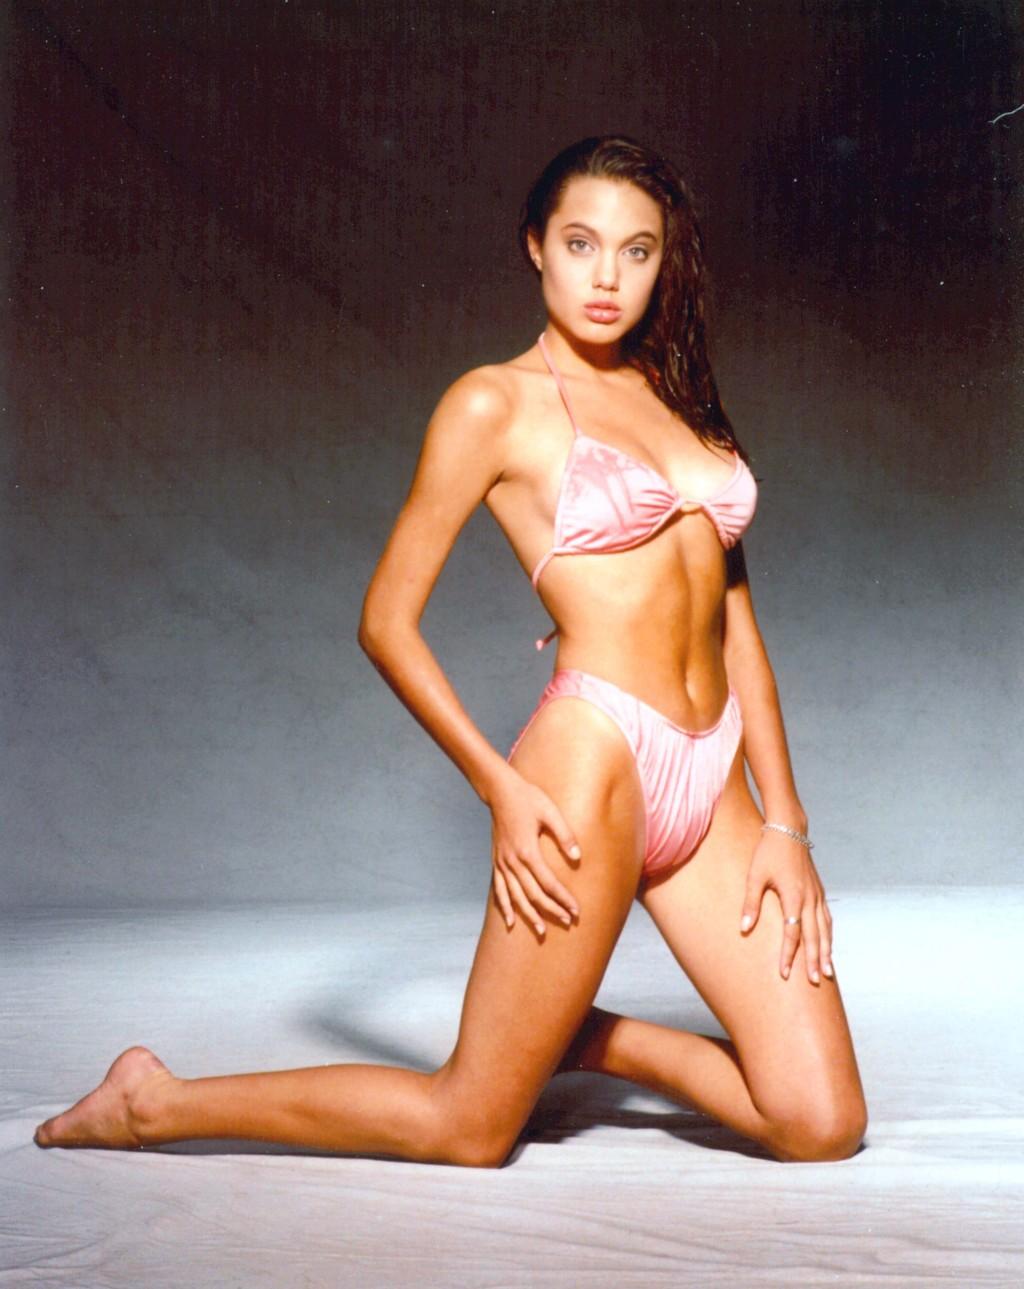 http://4.bp.blogspot.com/_hBDiC_aWJc4/TExg8TMgsGI/AAAAAAAADzo/d3TZyBK6YSw/s1600/angelina-jolie-bikini-1.jpg